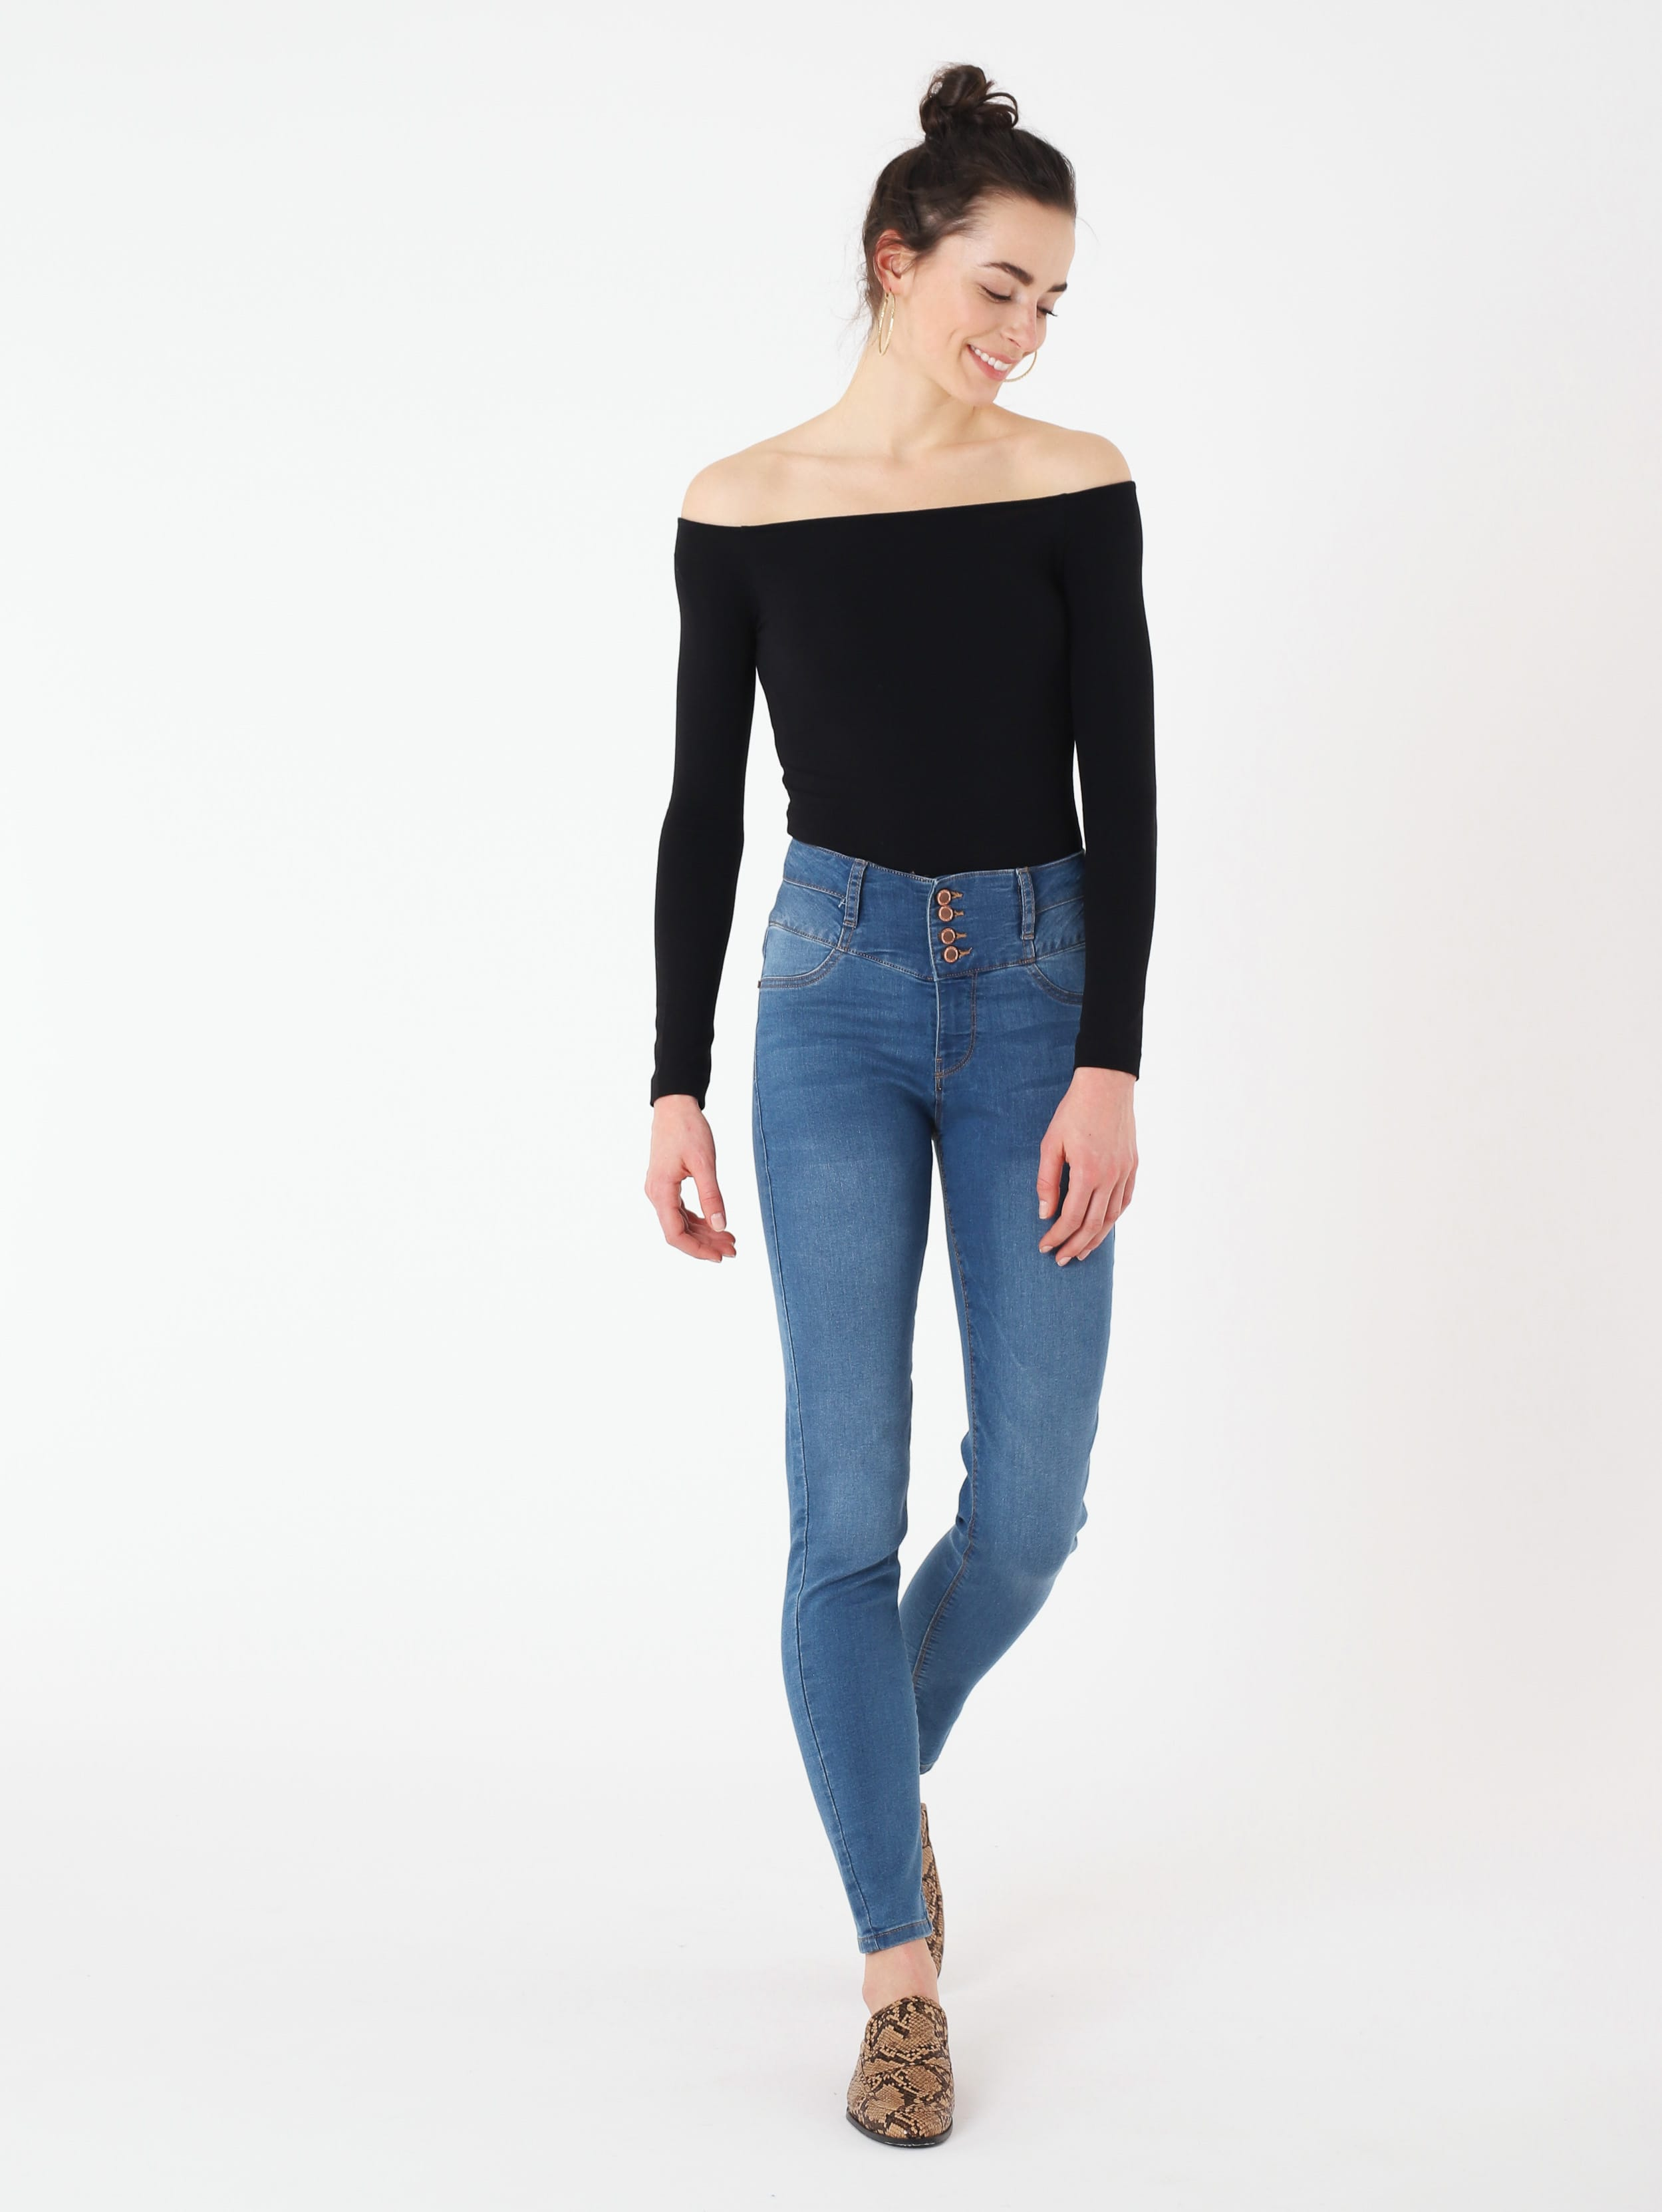 Jeans a vita alta Terranova a 19,99 euro